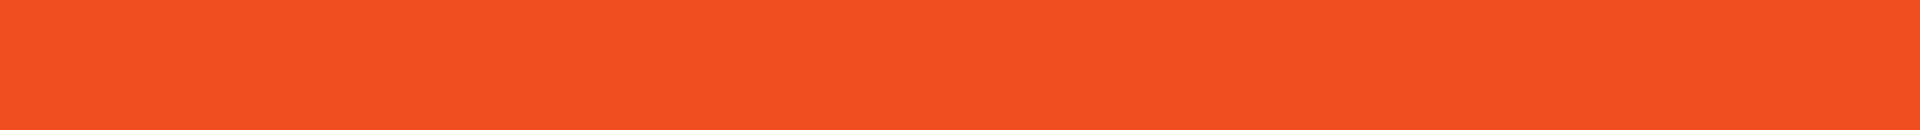 orange_line